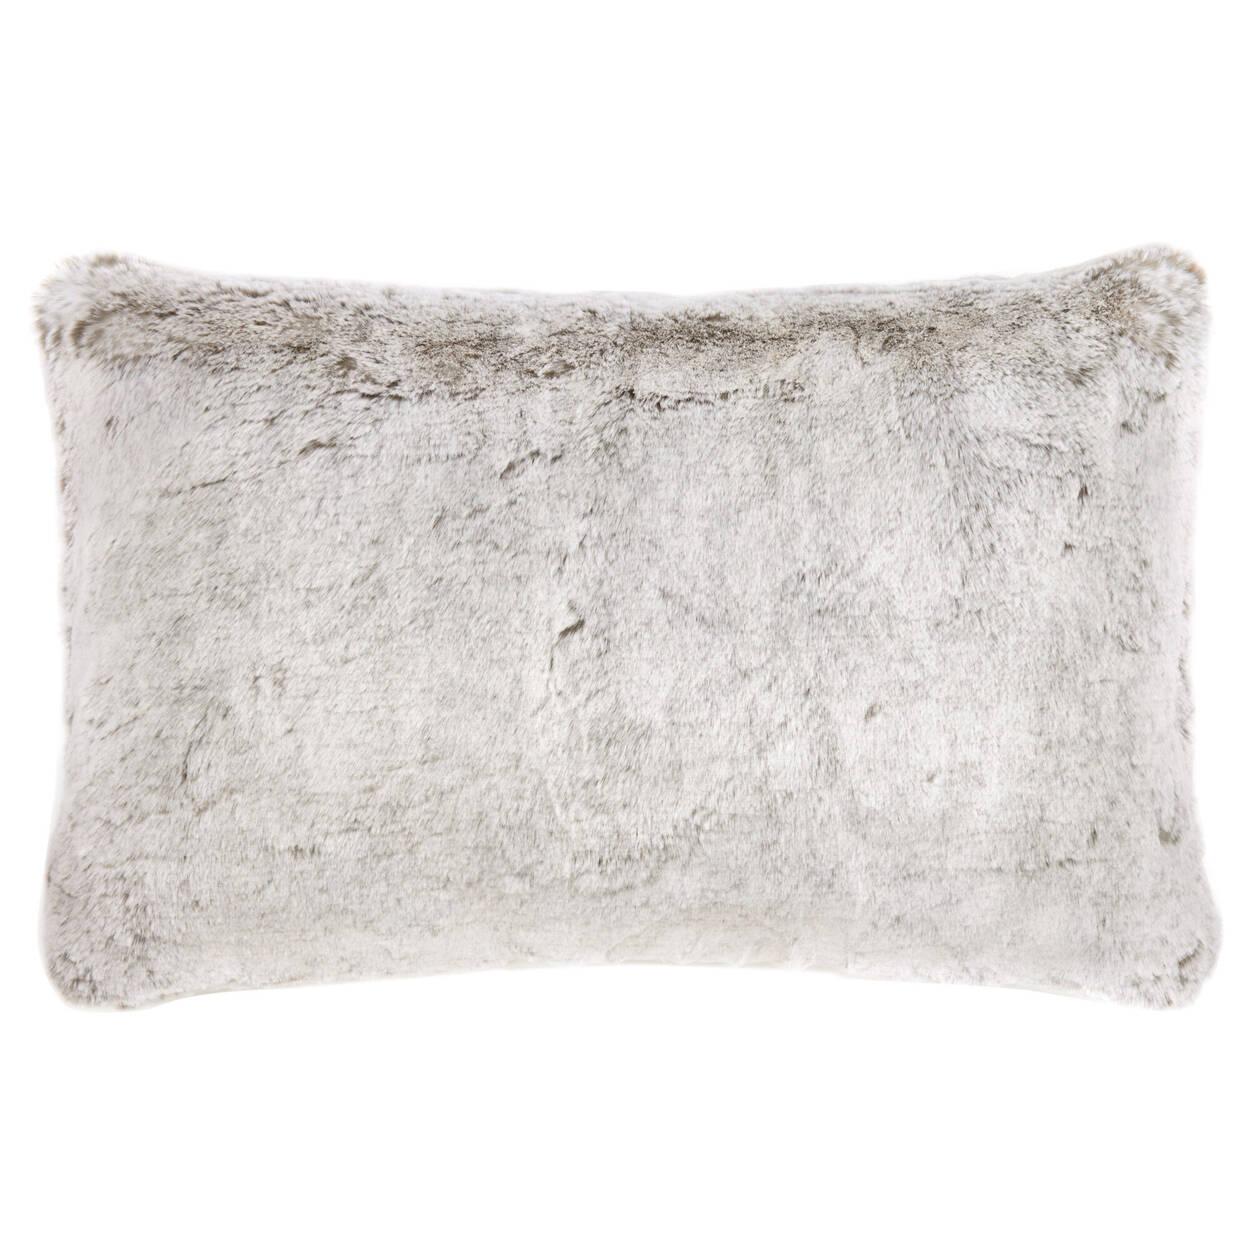 "Silver Fox Faux Fur Decorative Lumbar Pillow 14"" x 22"""